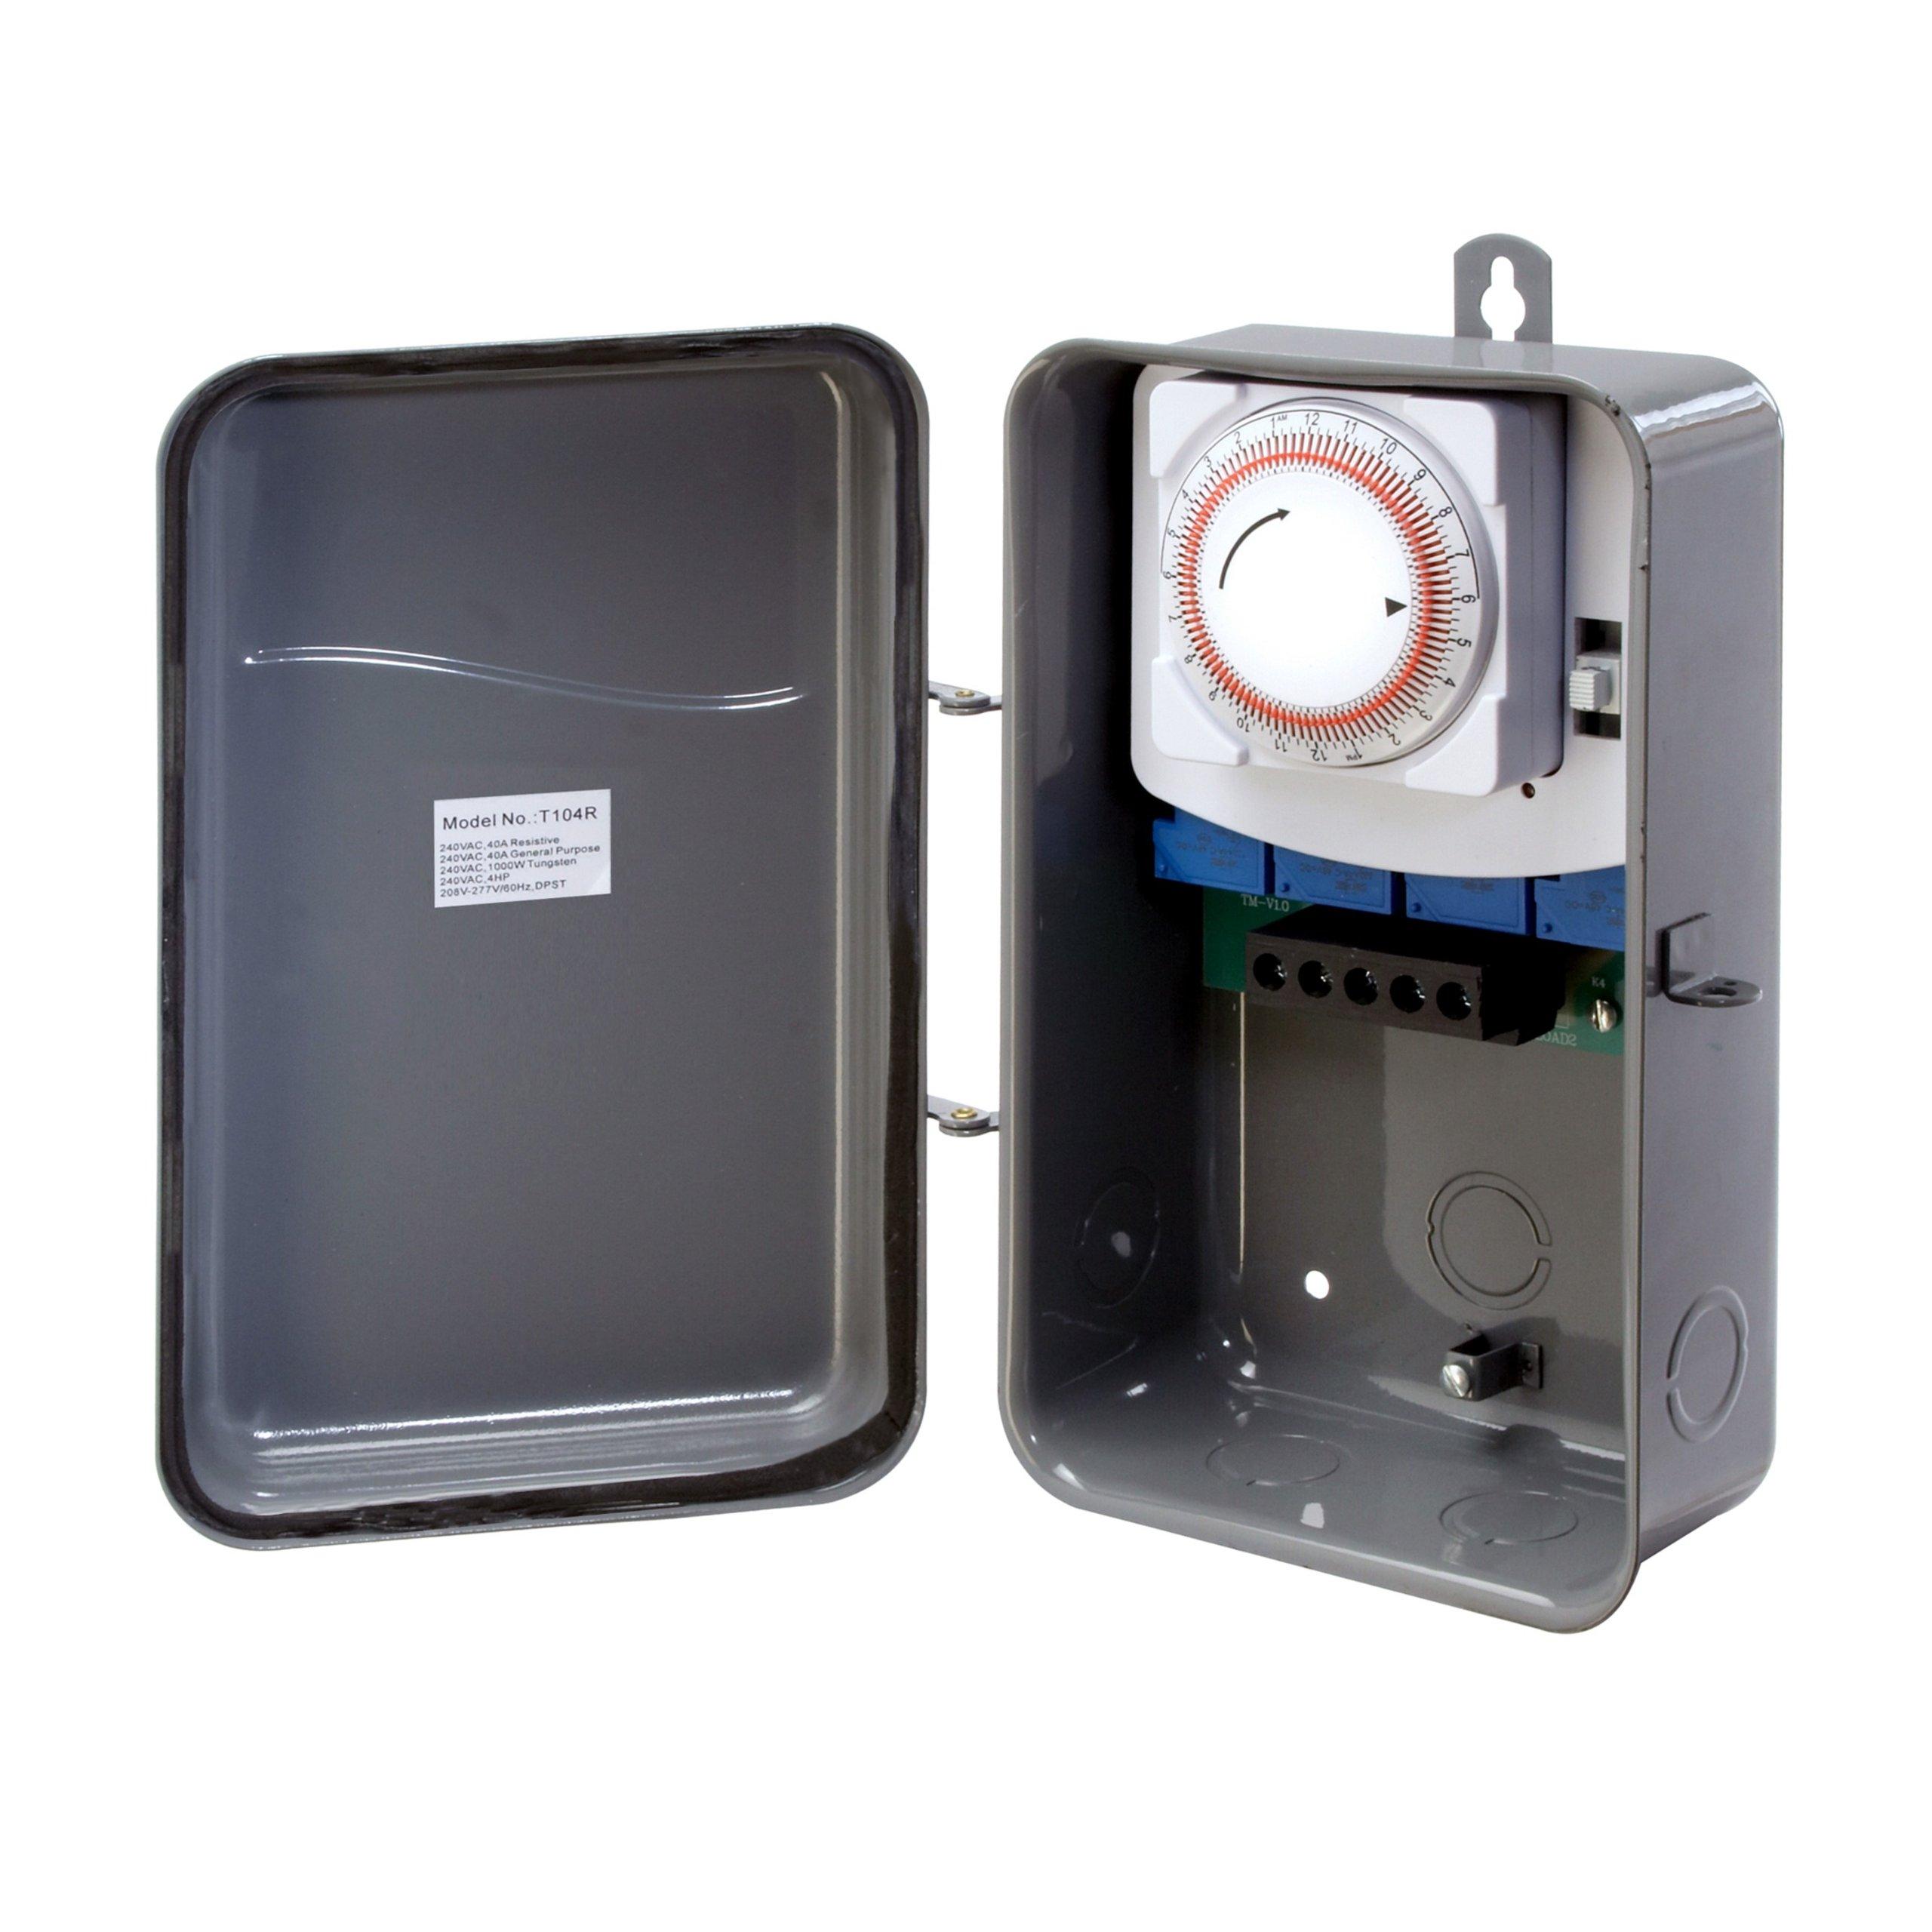 Westek TM104R 208 to 277 Volt DPST 40 AMP Hardwire Outdoor Heavy Duty Mechanical Timer Switch, Gray